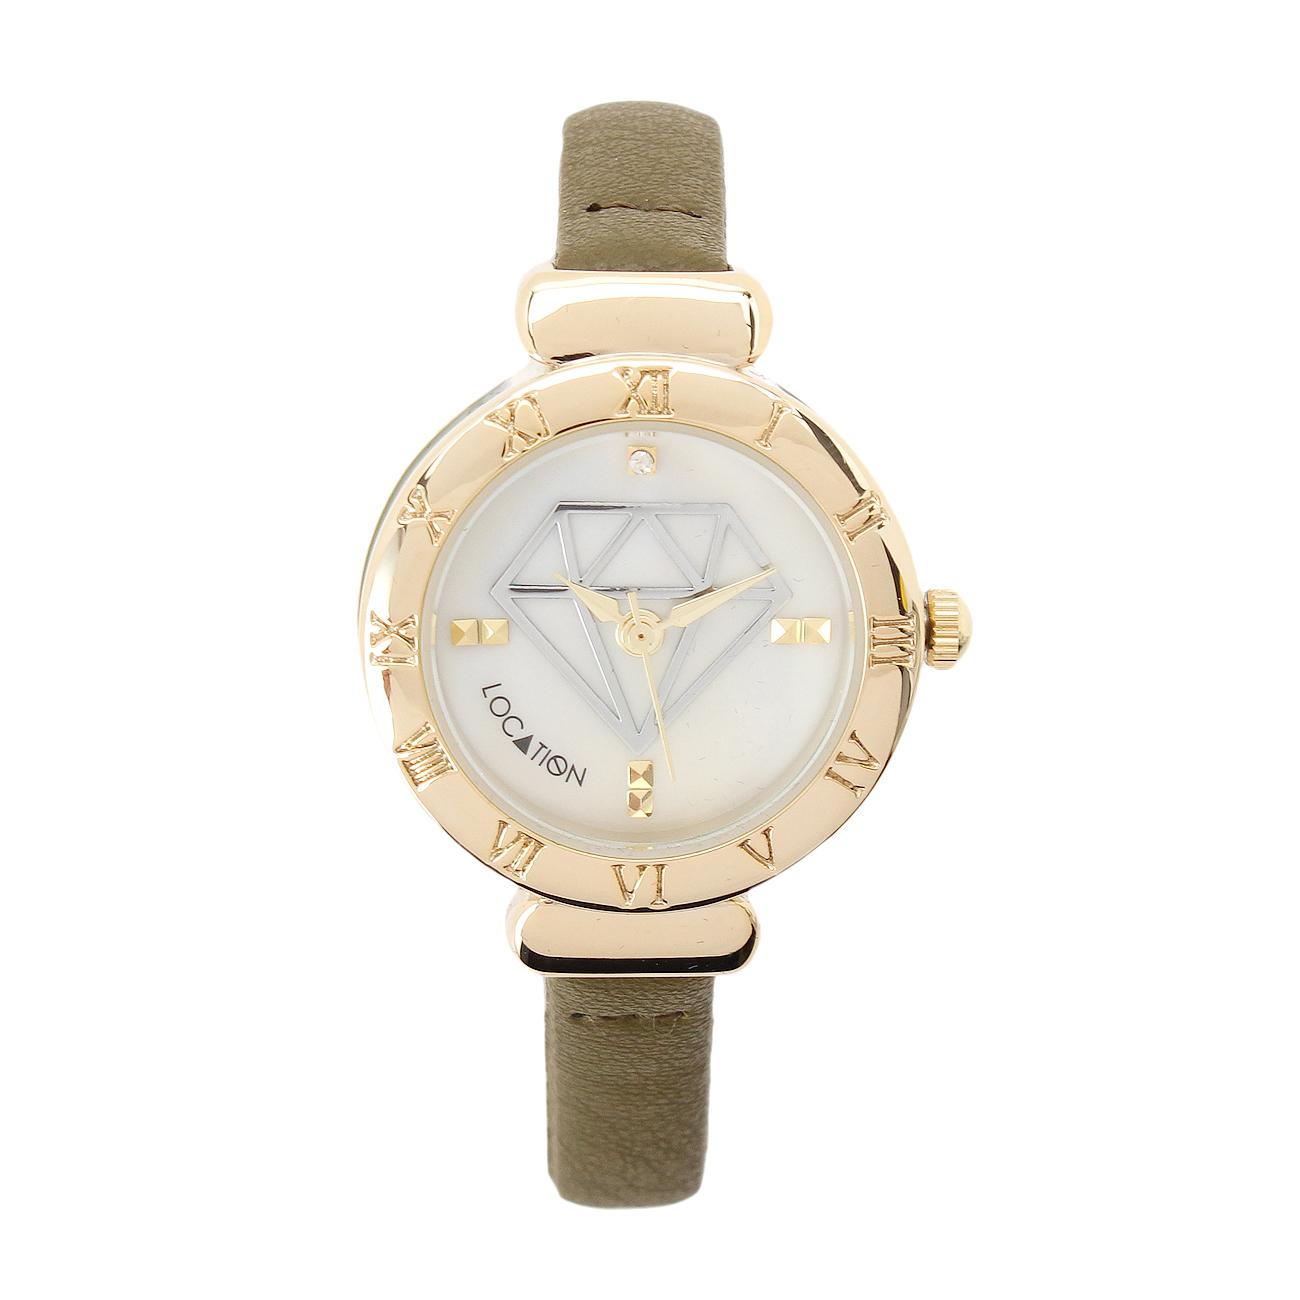 【LOCATION (ロケーション)】ダイヤデザインラウンドウォッチレディース 雑貨|腕時計 ダークグリーン